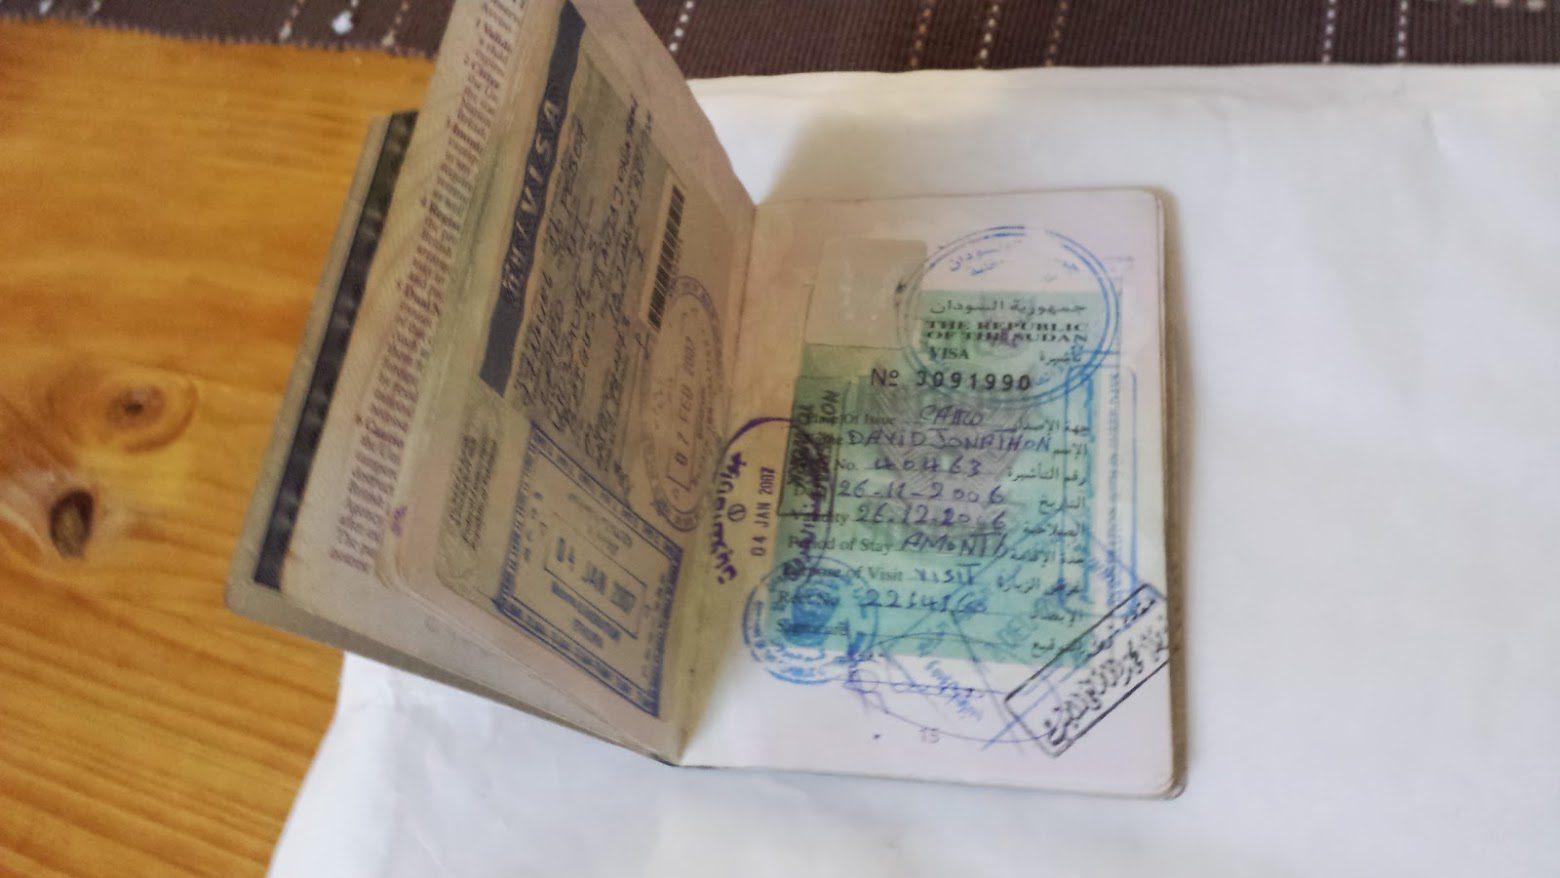 My visa from Sudan